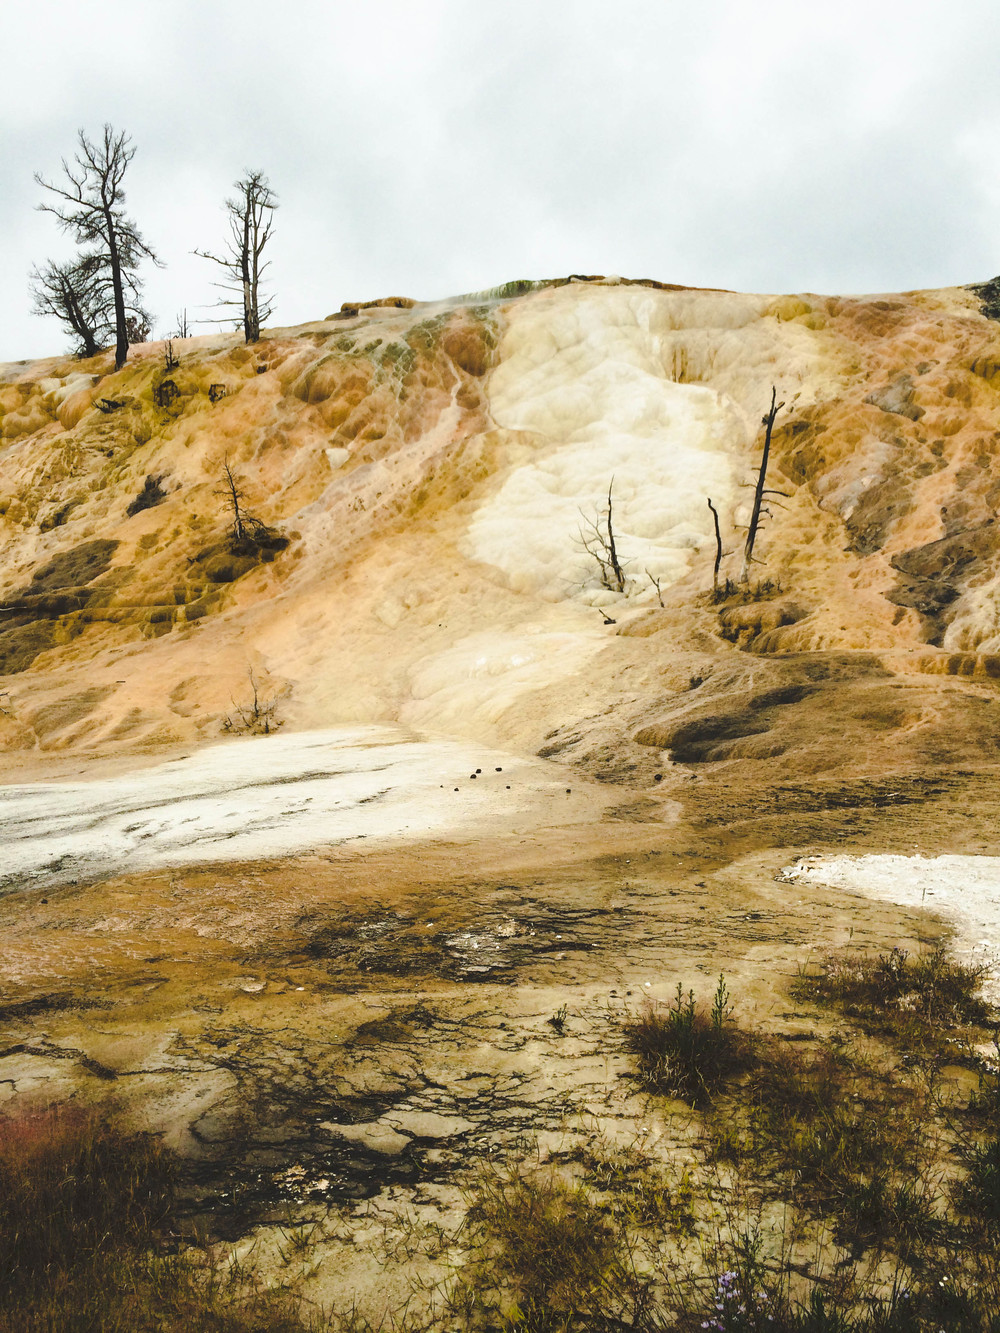 mammoth hotsprings lune idyll guide blog yellowstone (2 of 5).jpg